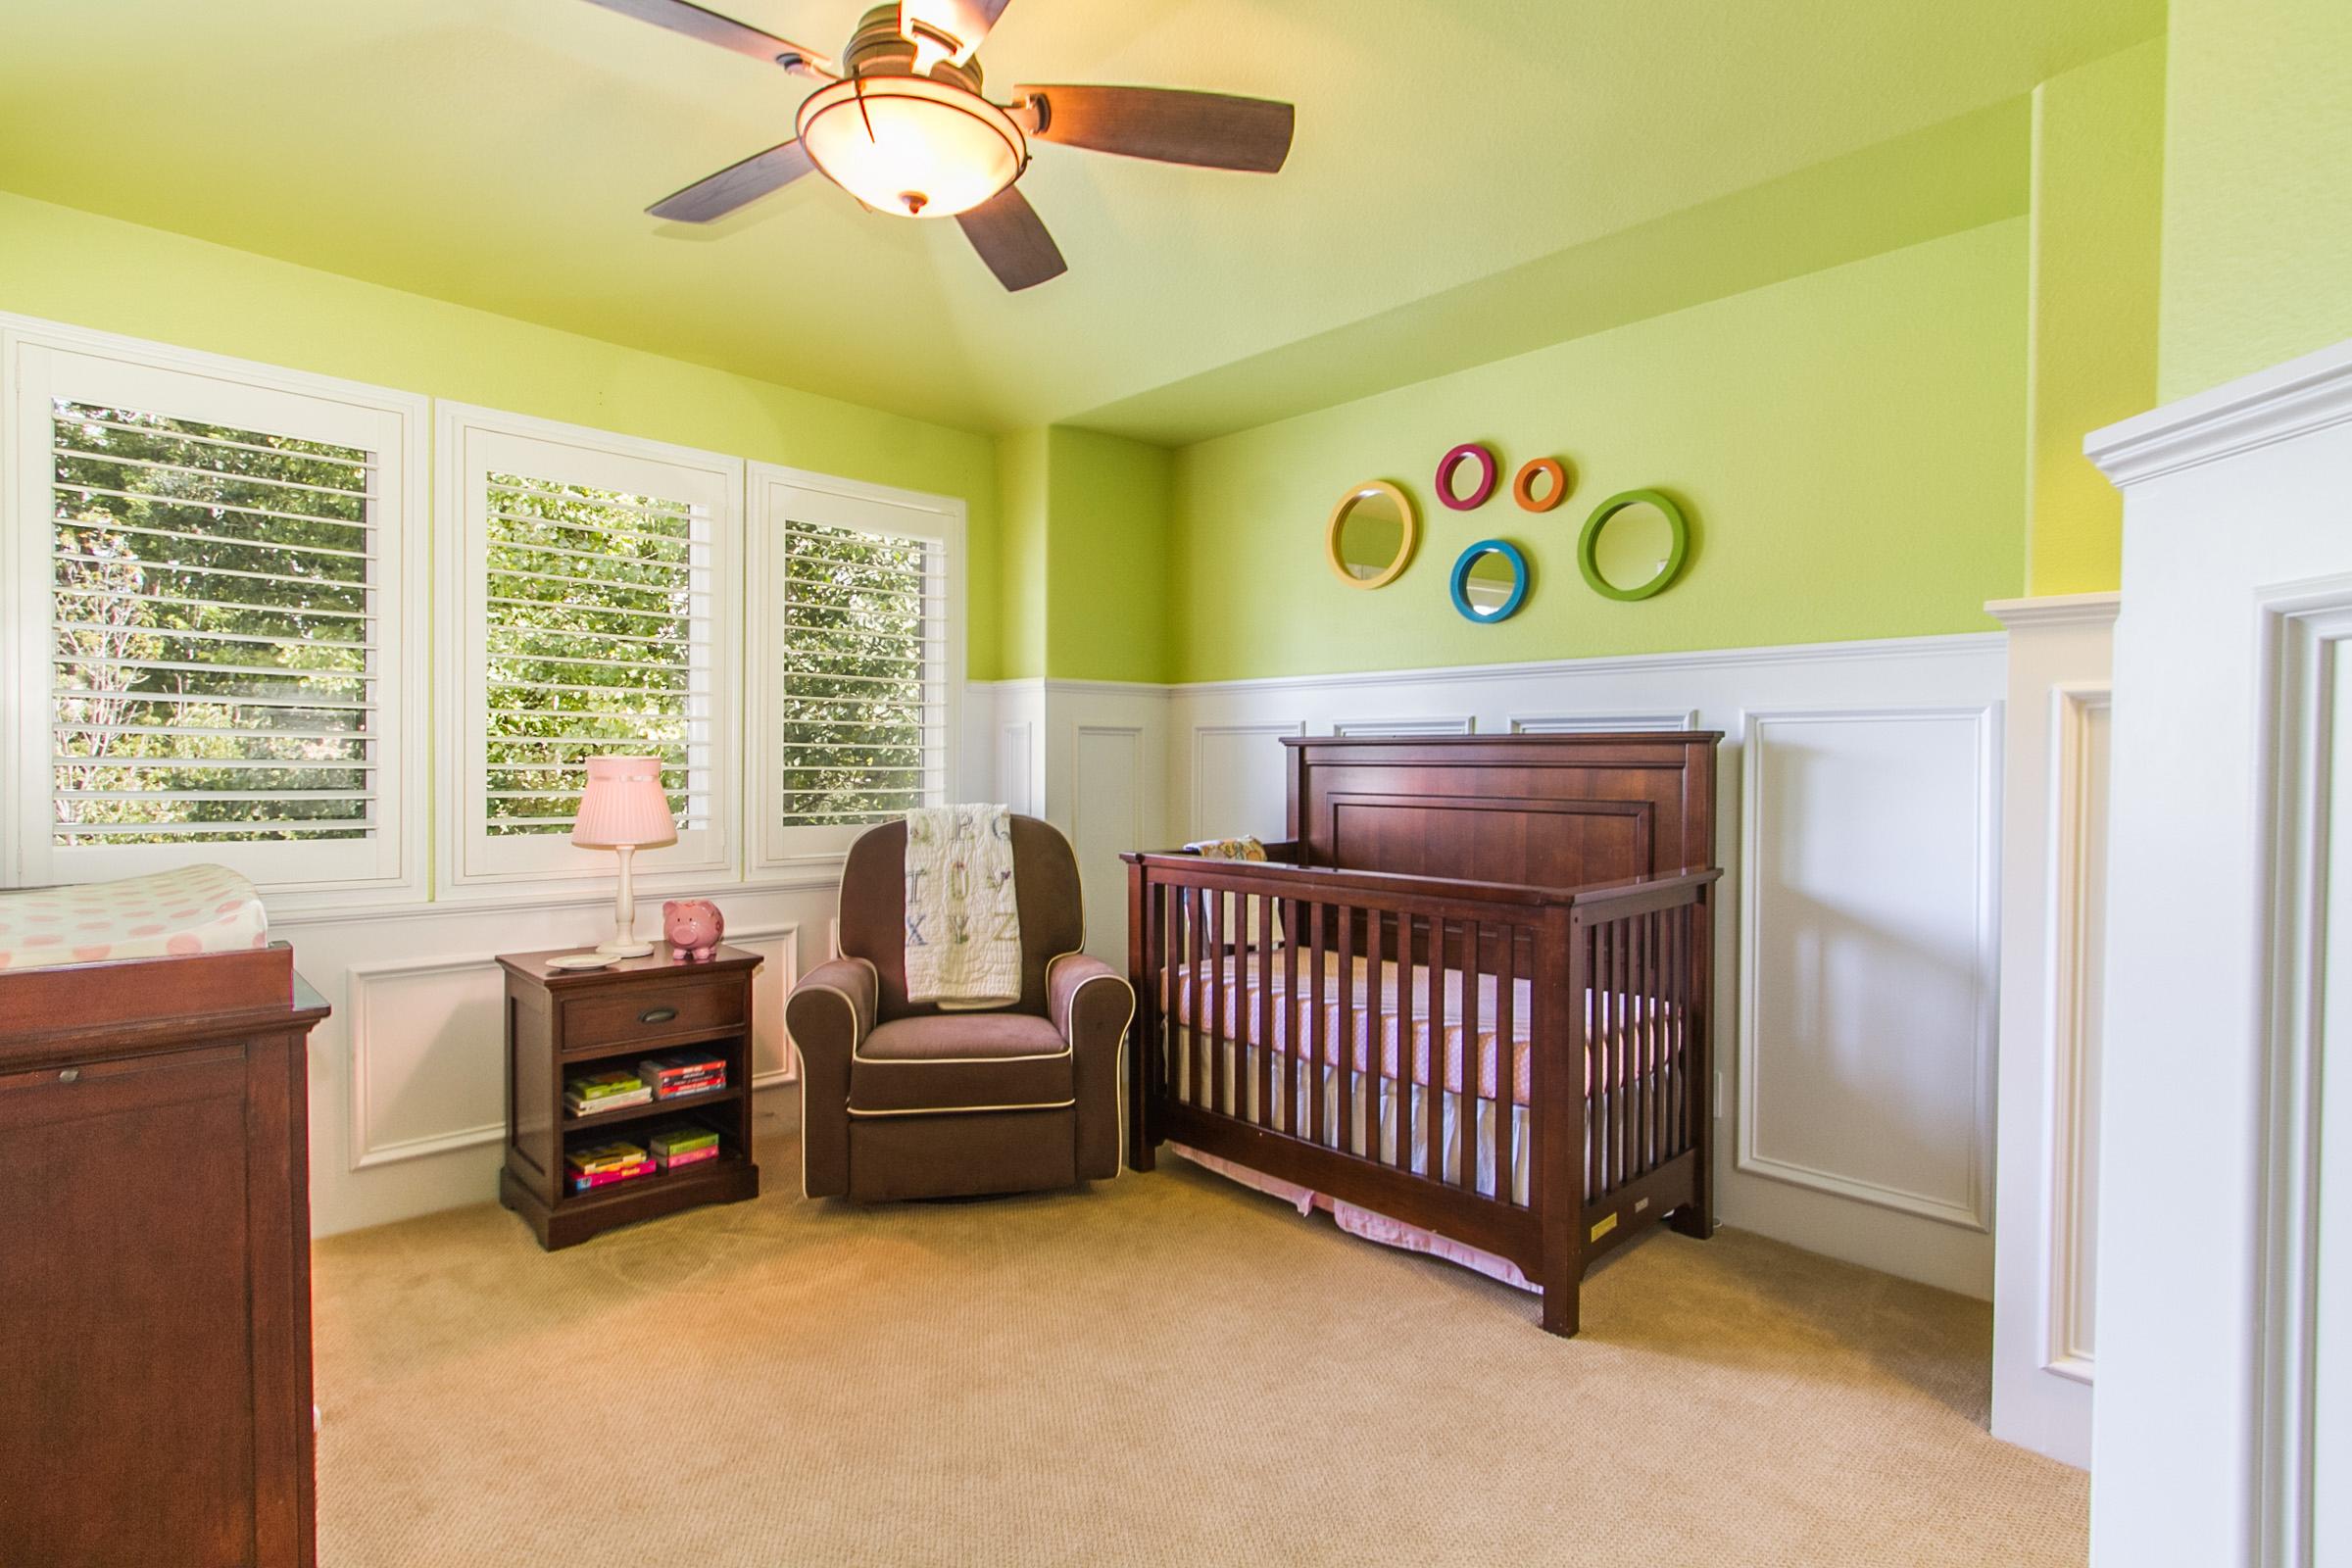 1368016_Charming-Bedroom-Three-Has-Tall-Wainscot_high.jpg